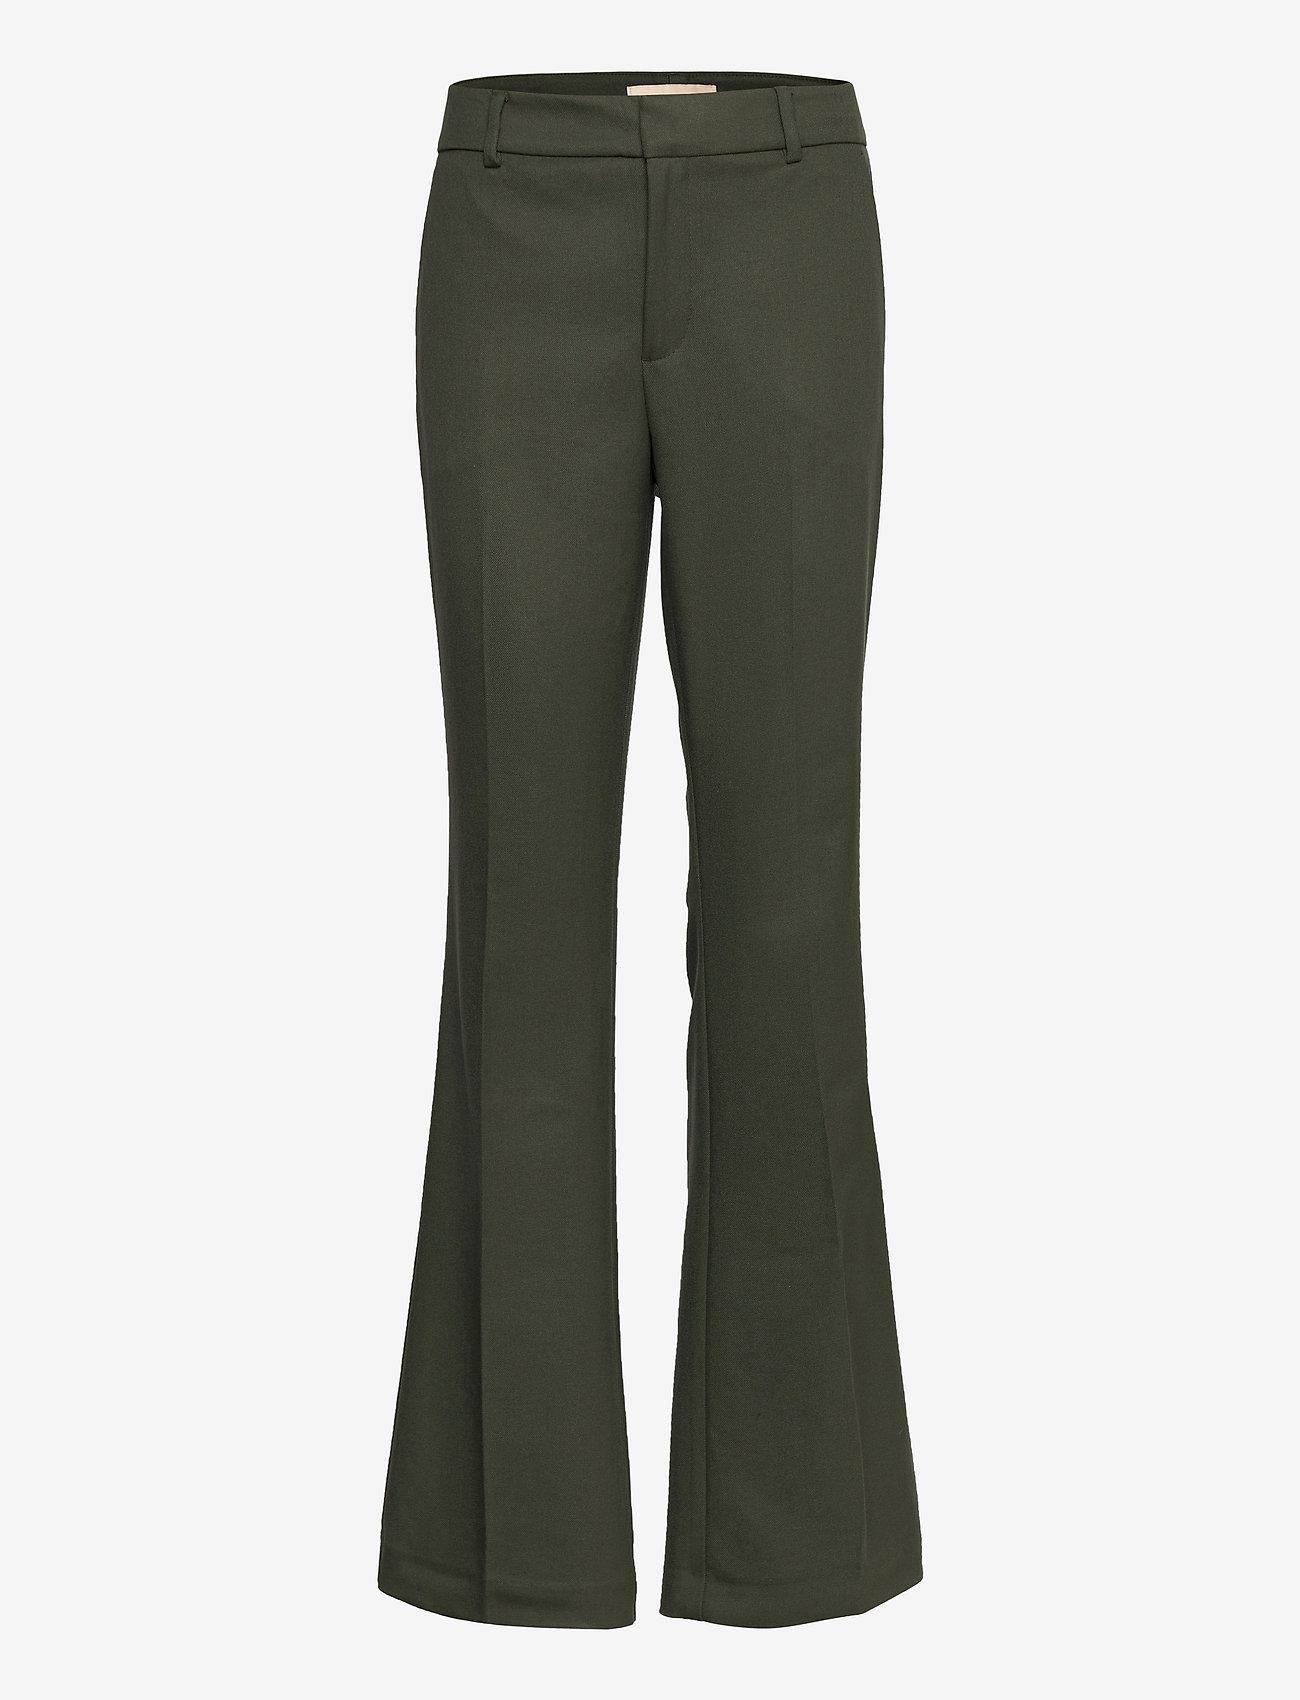 MOS MOSH - Farrah Twiggy Pant Sustainable - schlaghosen - duffel bag - 0